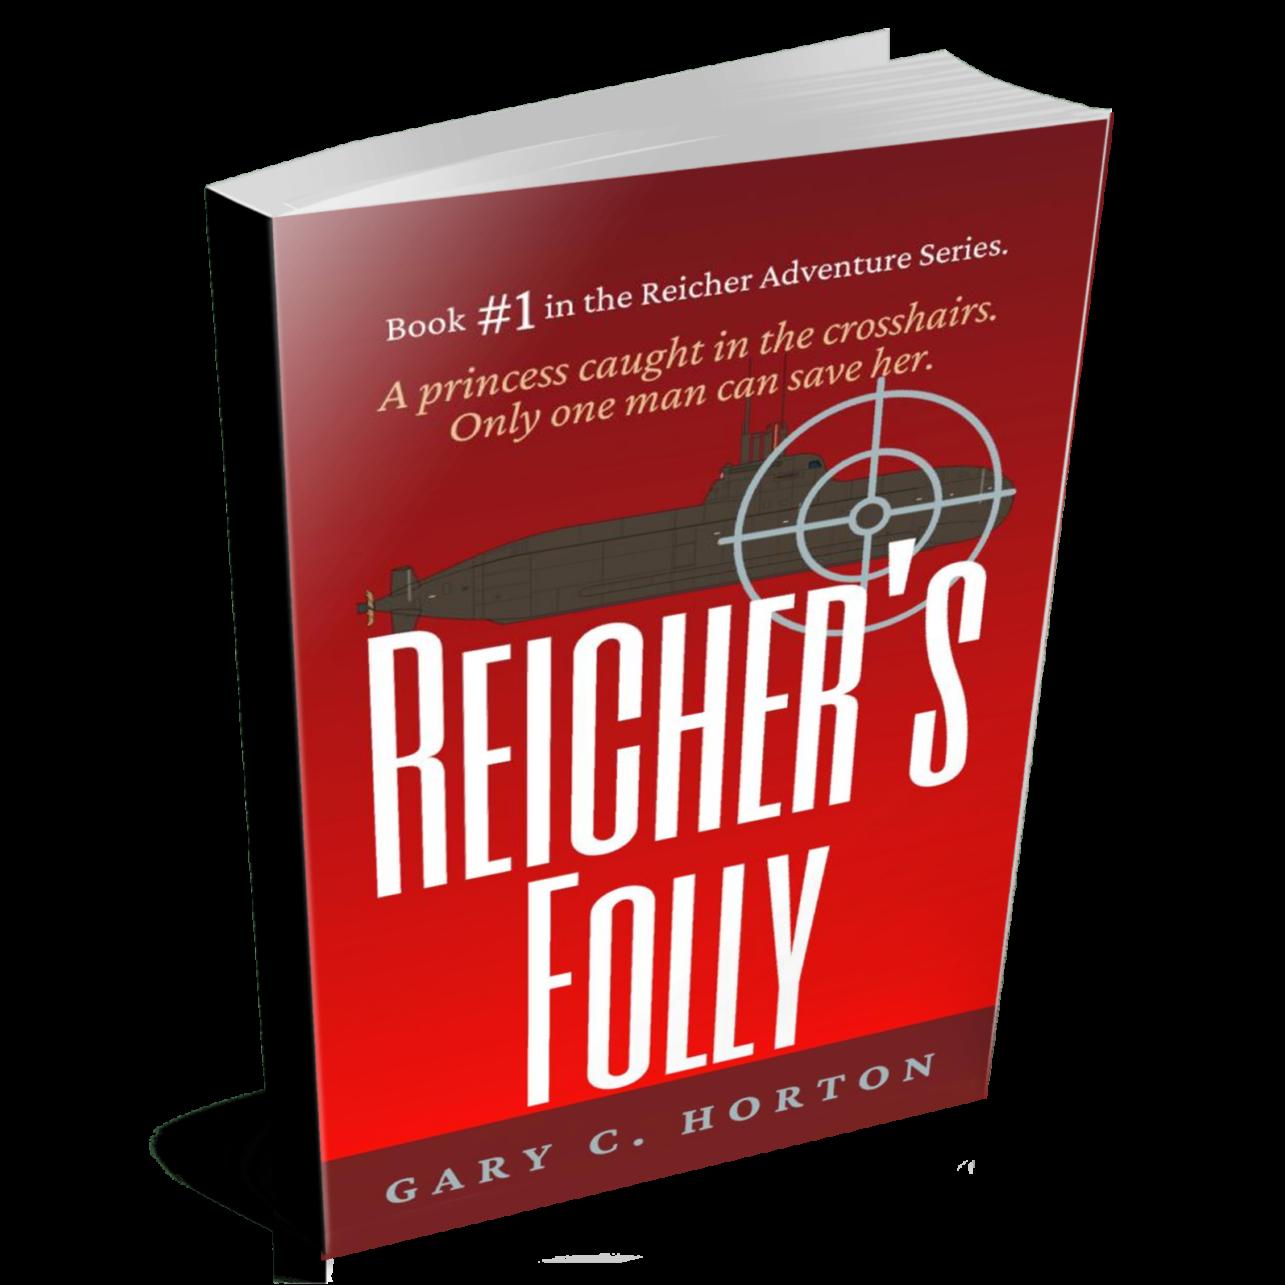 Reicher's Folly - a novel by Gary C. Horton